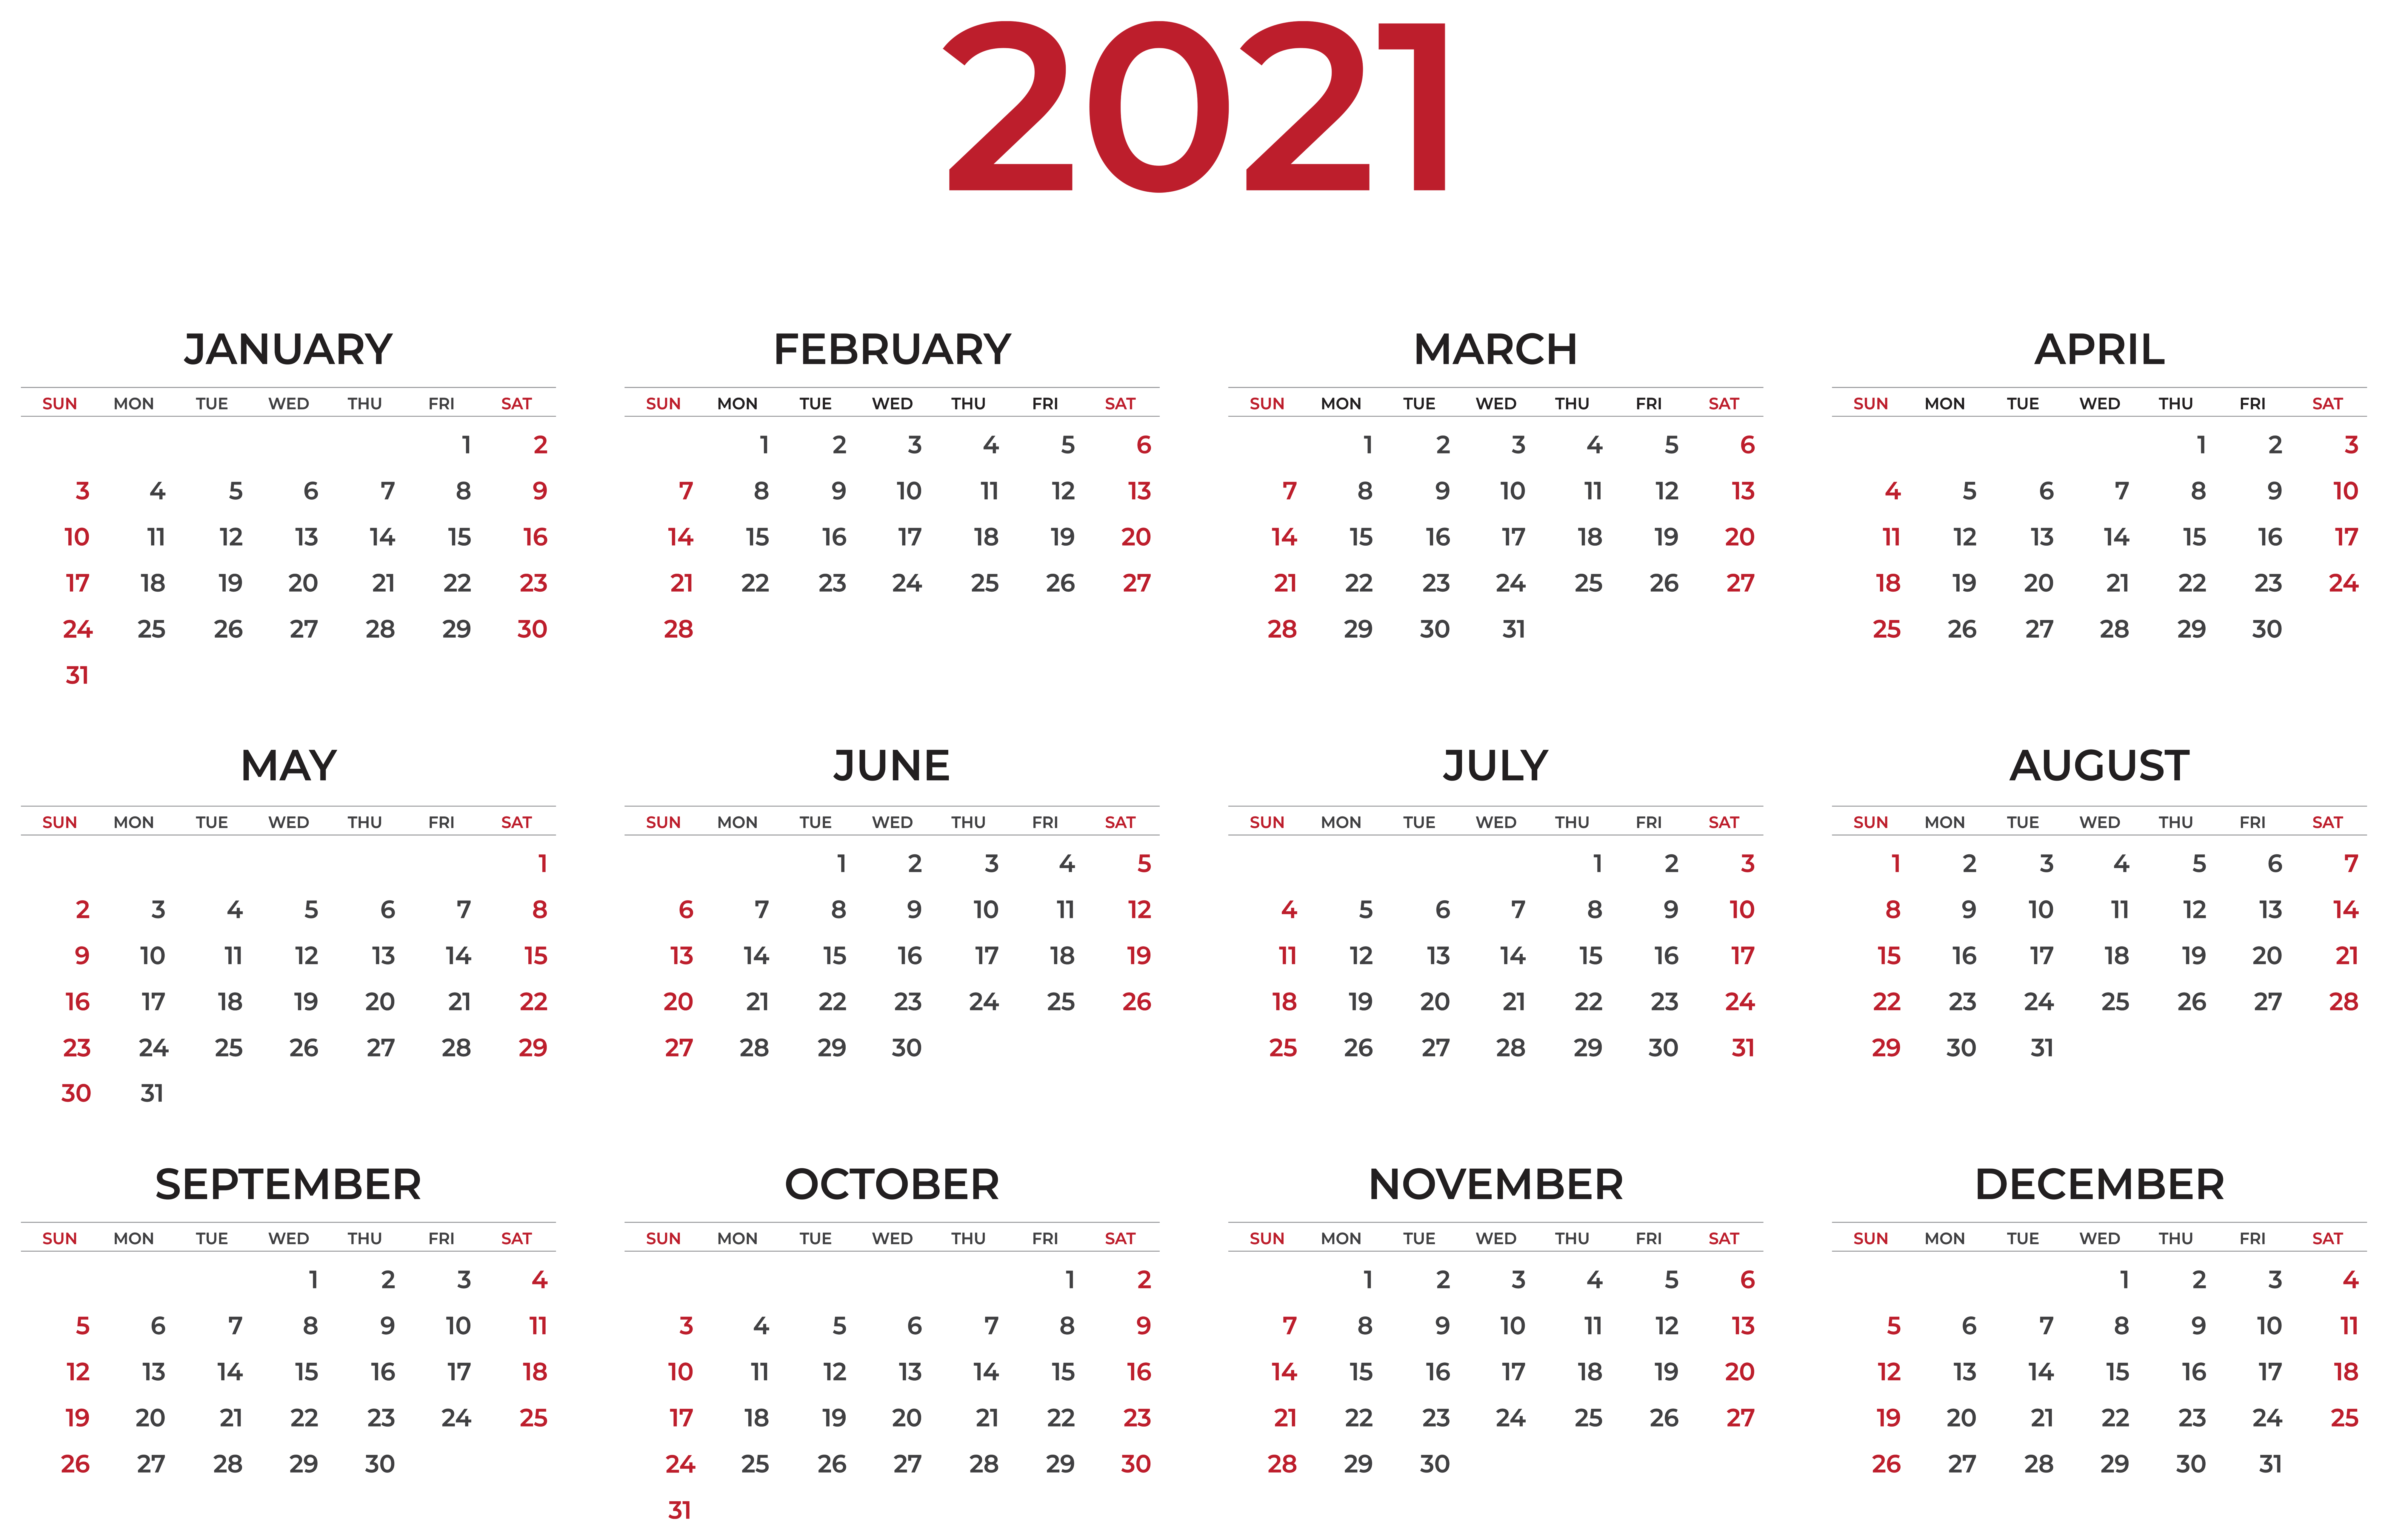 2021 Calendar Transparent Clipart.